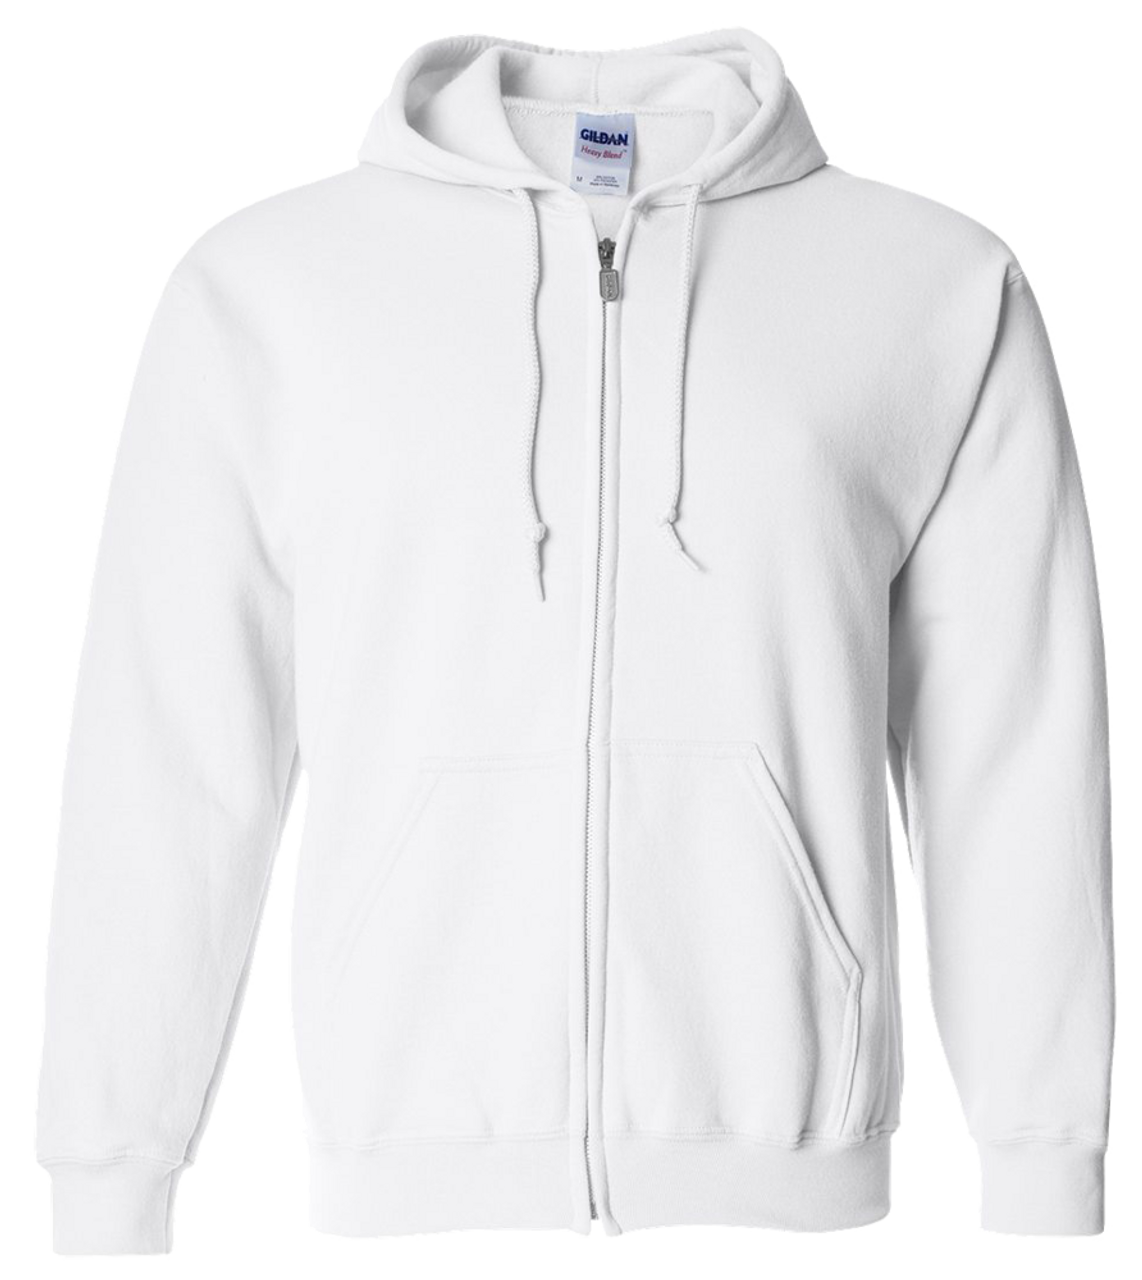 G18600 in white